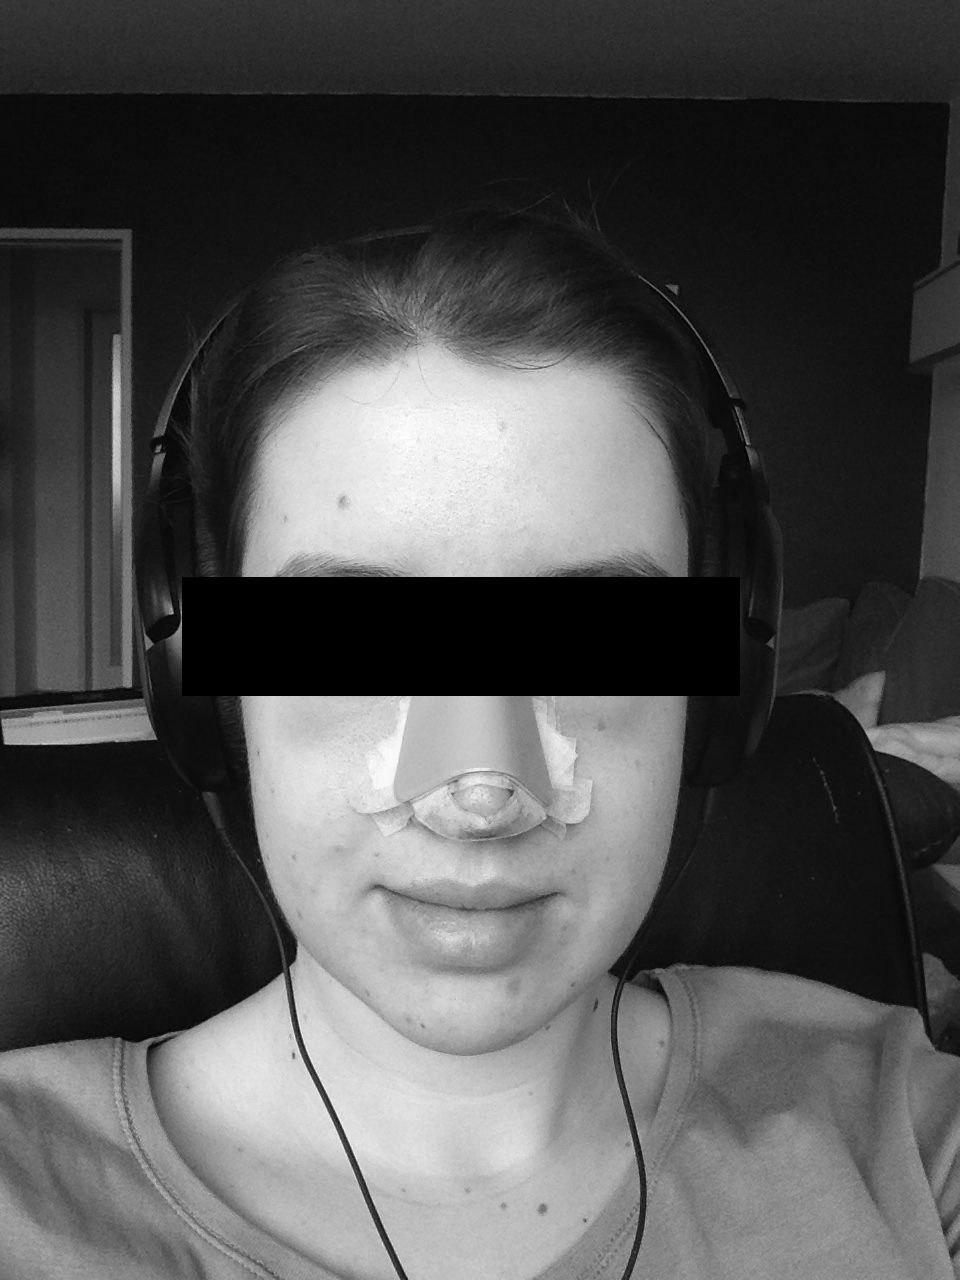 Nasenkorrektur Erfahrung